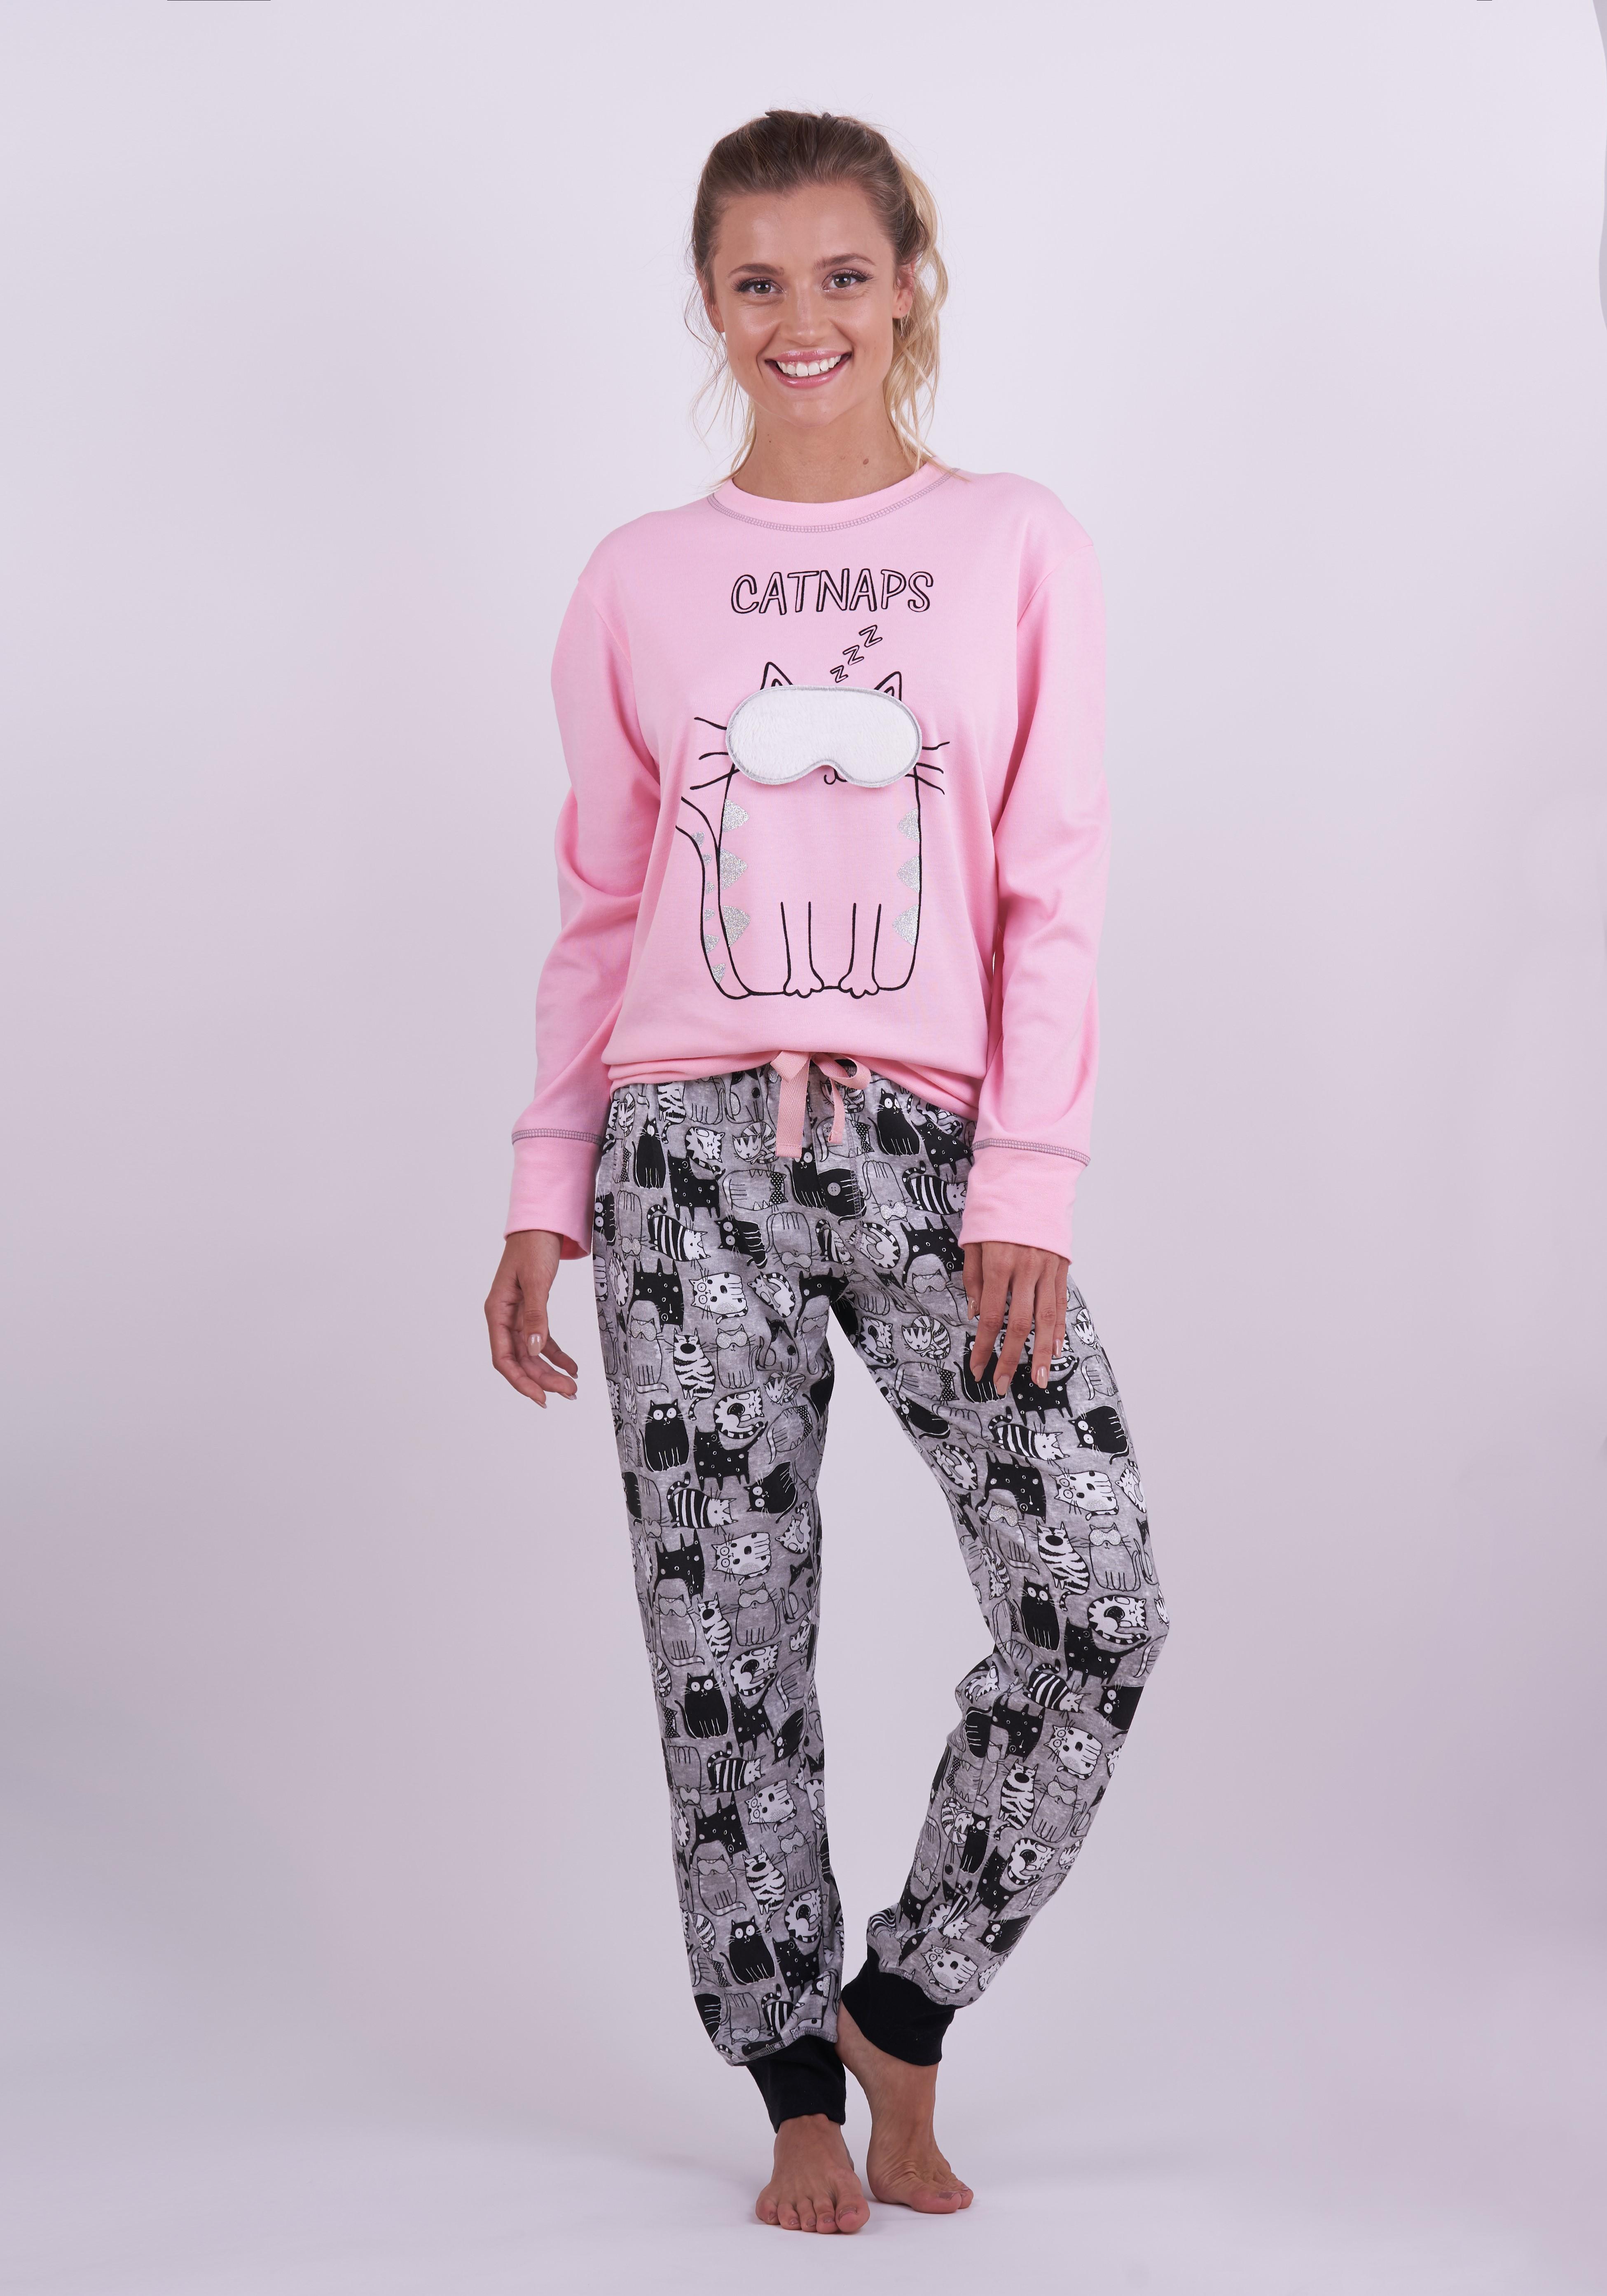 CatNaps Pyjama Pant Set